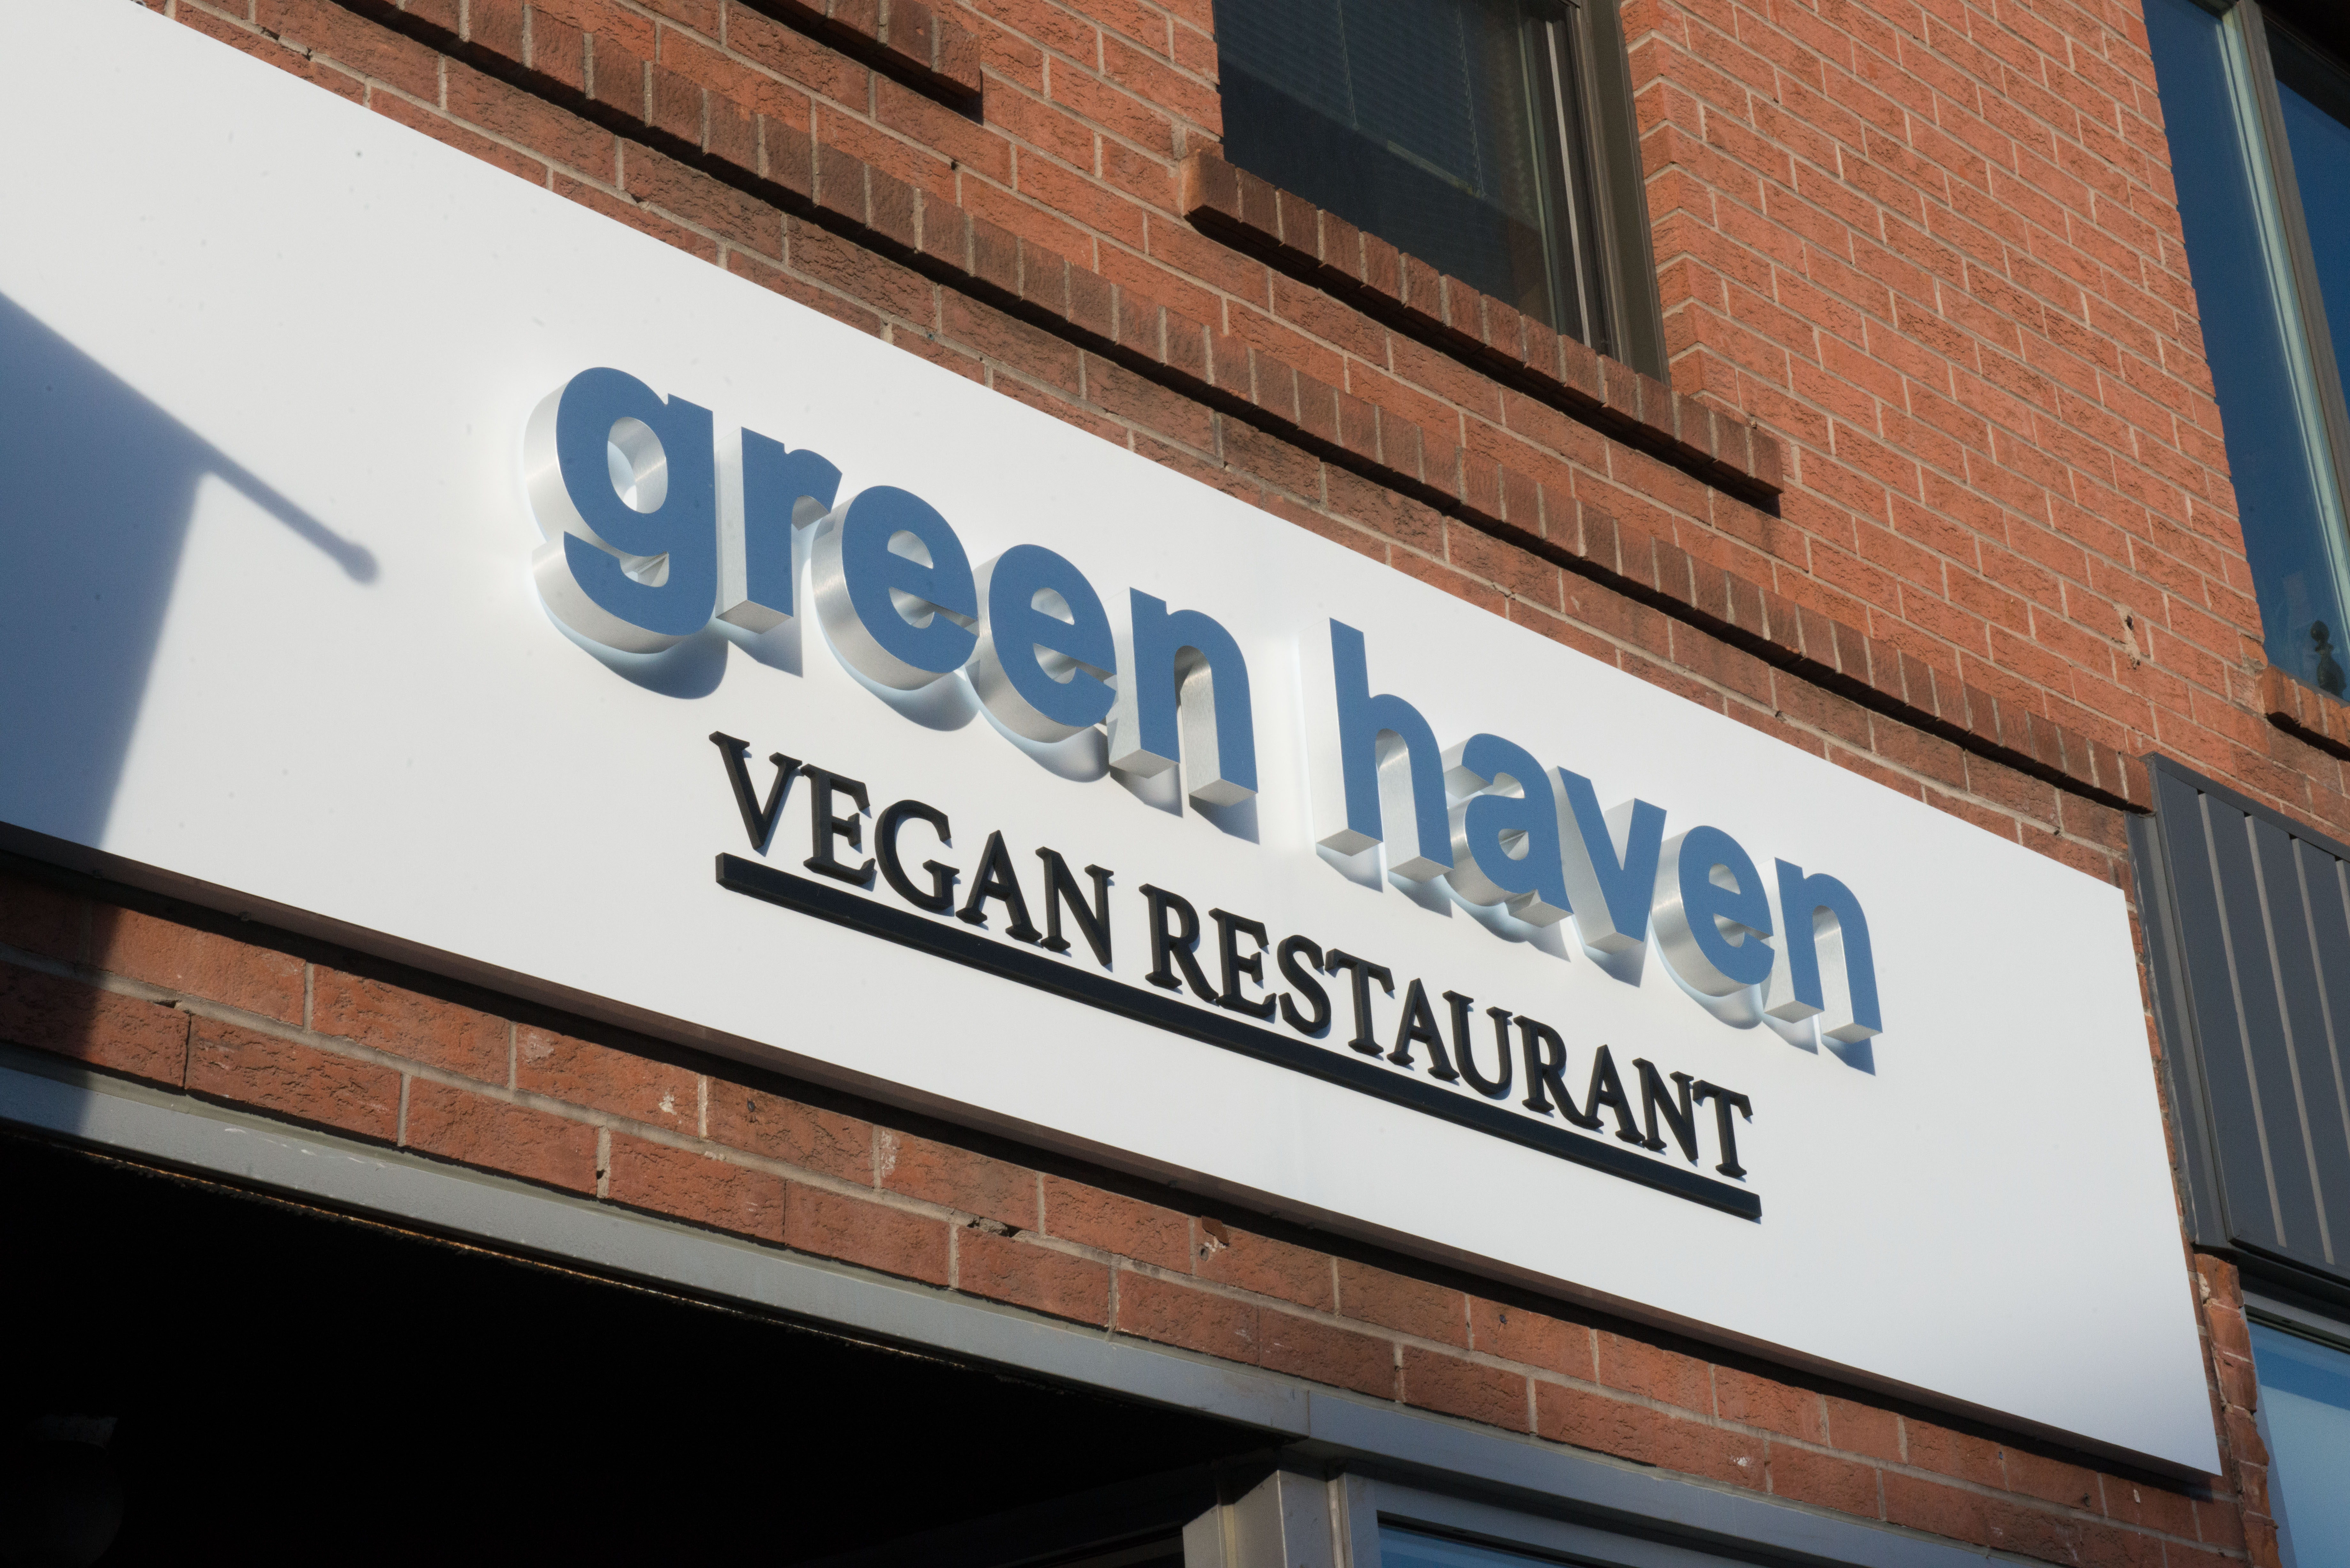 vegan-food-1_49084955656_o